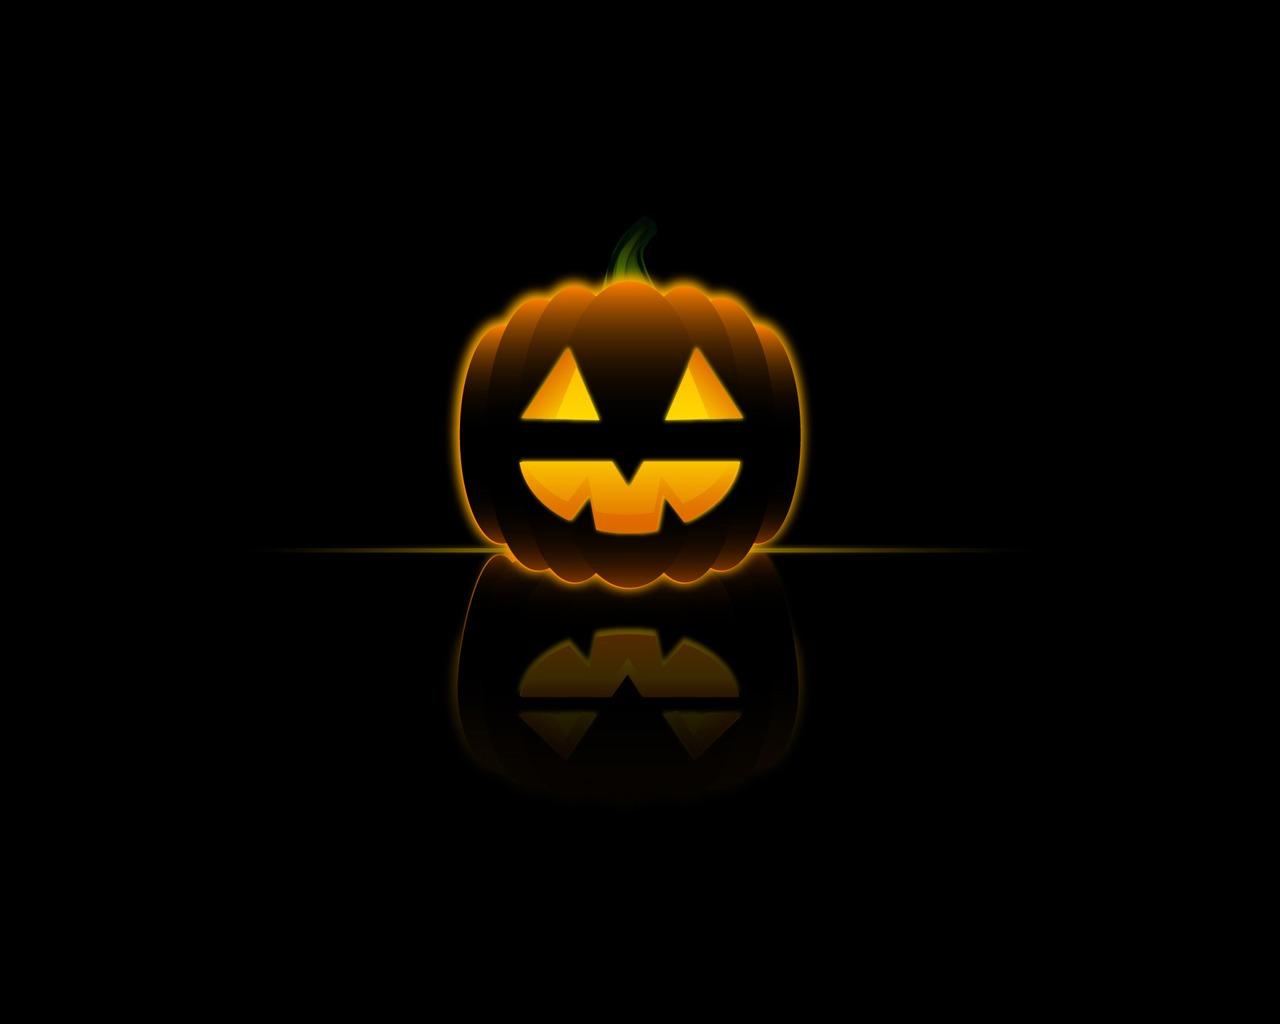 Amazing Wallpaper Halloween Iphone 5 - halloween_pumpkin_wallpaper_halloween_holidays_3240  Collection_312474.jpg